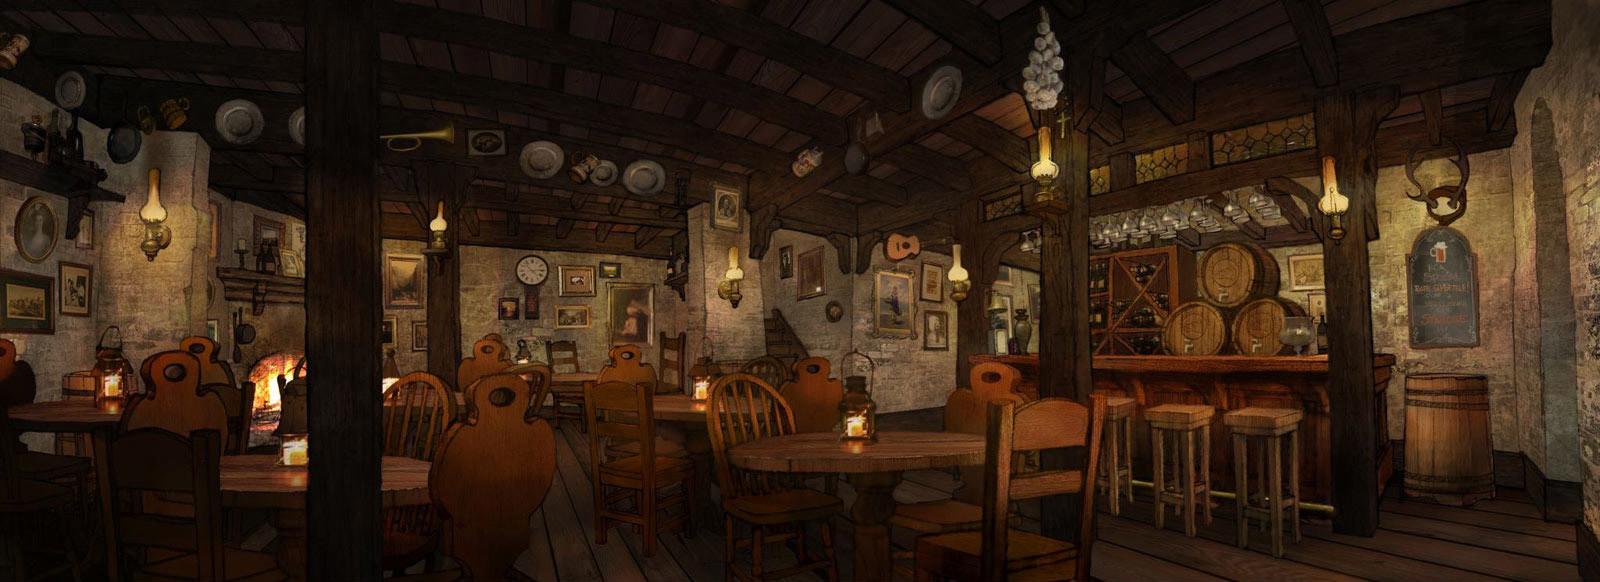 https://cdnb.artstation.com/p/assets/images/images/008/585/927/large/zak-loiselle-tavern-concept-by-ron-lukas.jpg?1513735738